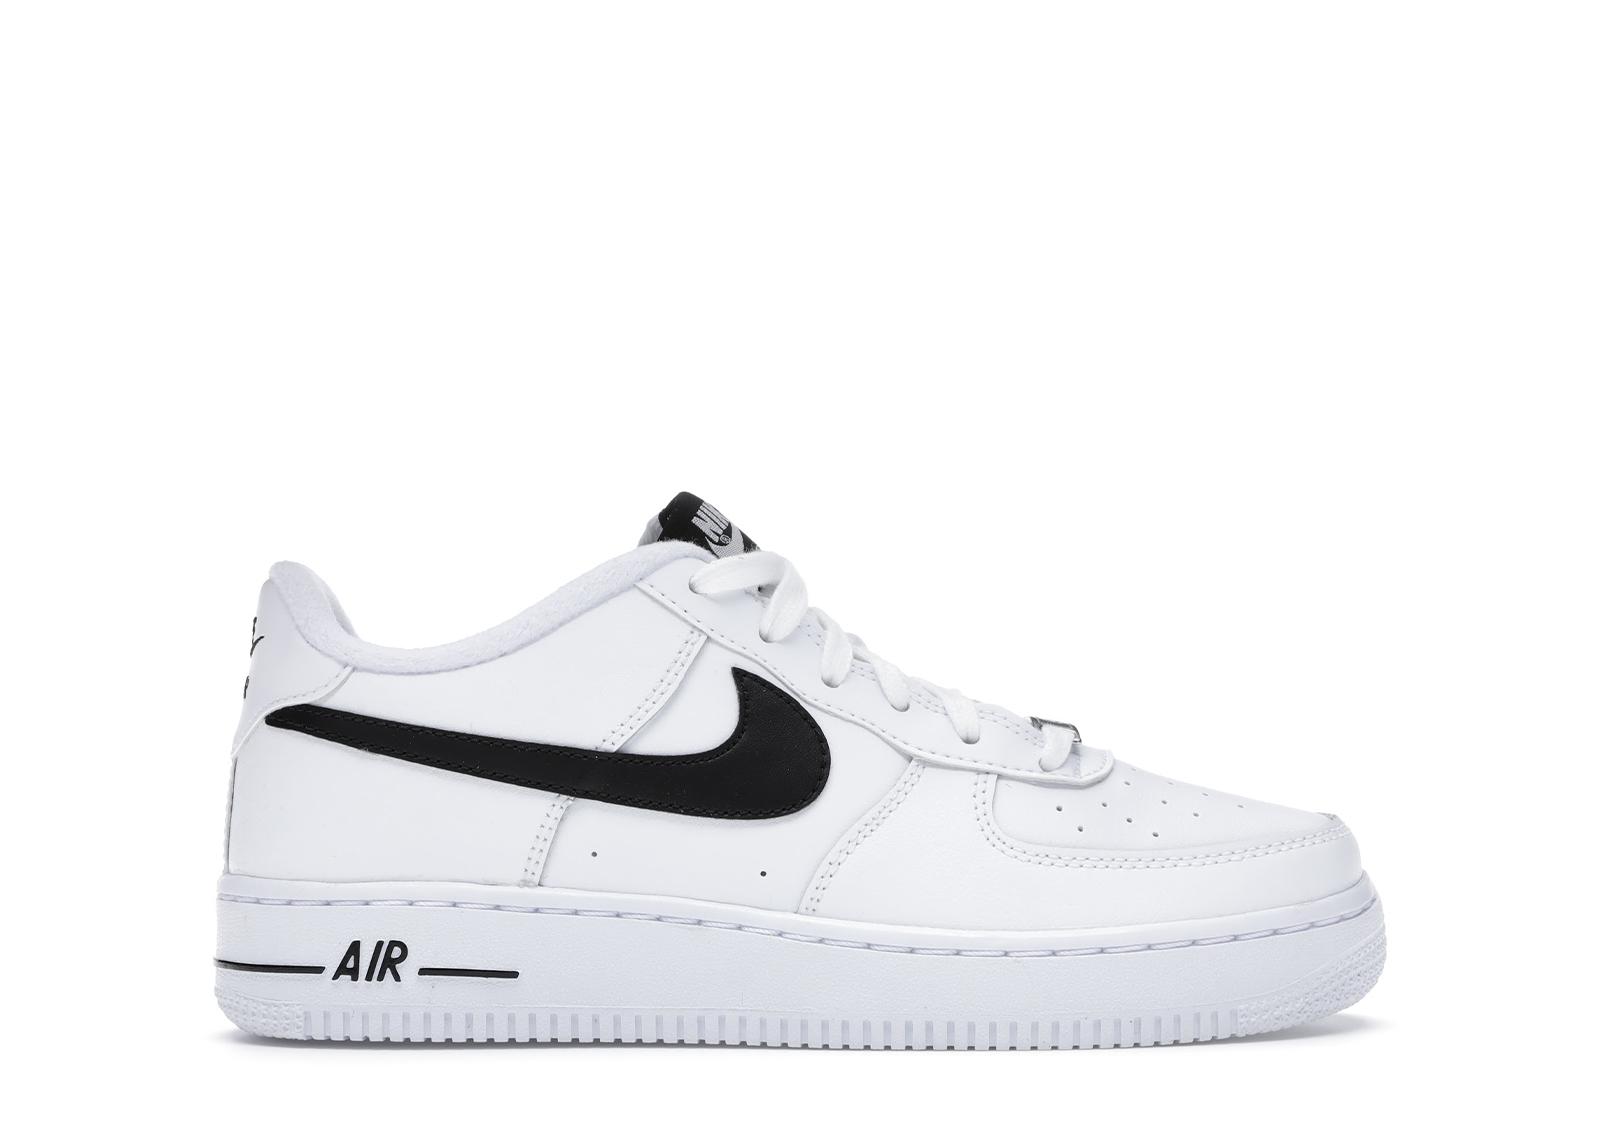 Nike Air Force 1 Low AN20 White Black (GS)